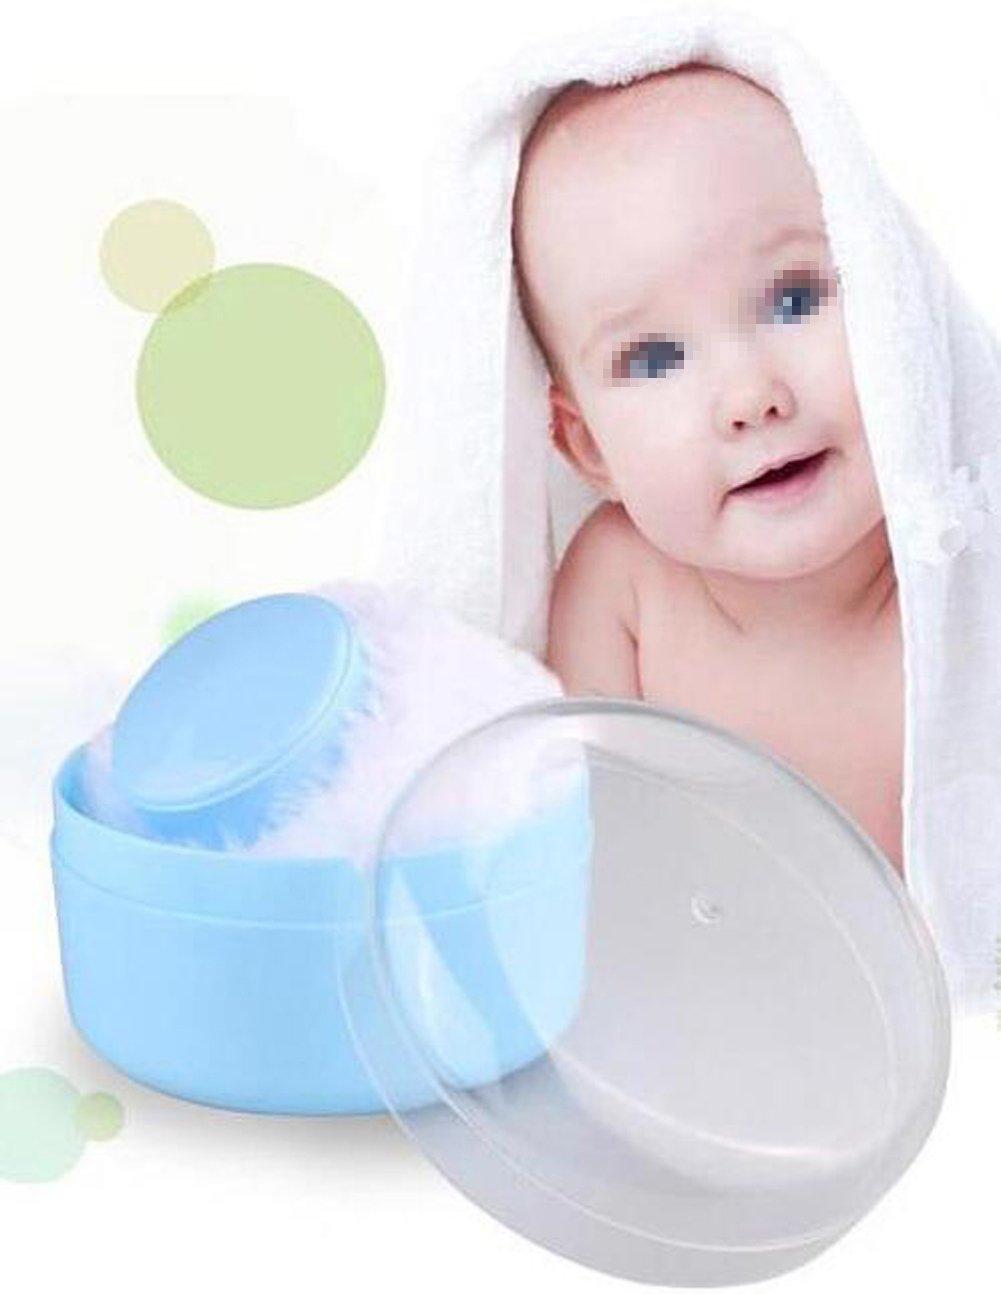 1 PC Baby After-Bath Soft Villus Powder Puff Box Container Empty Box Portable Automatic Powder Storage Baby Powder Cartridge Newborn Cartridge Mini-Blue erioctry